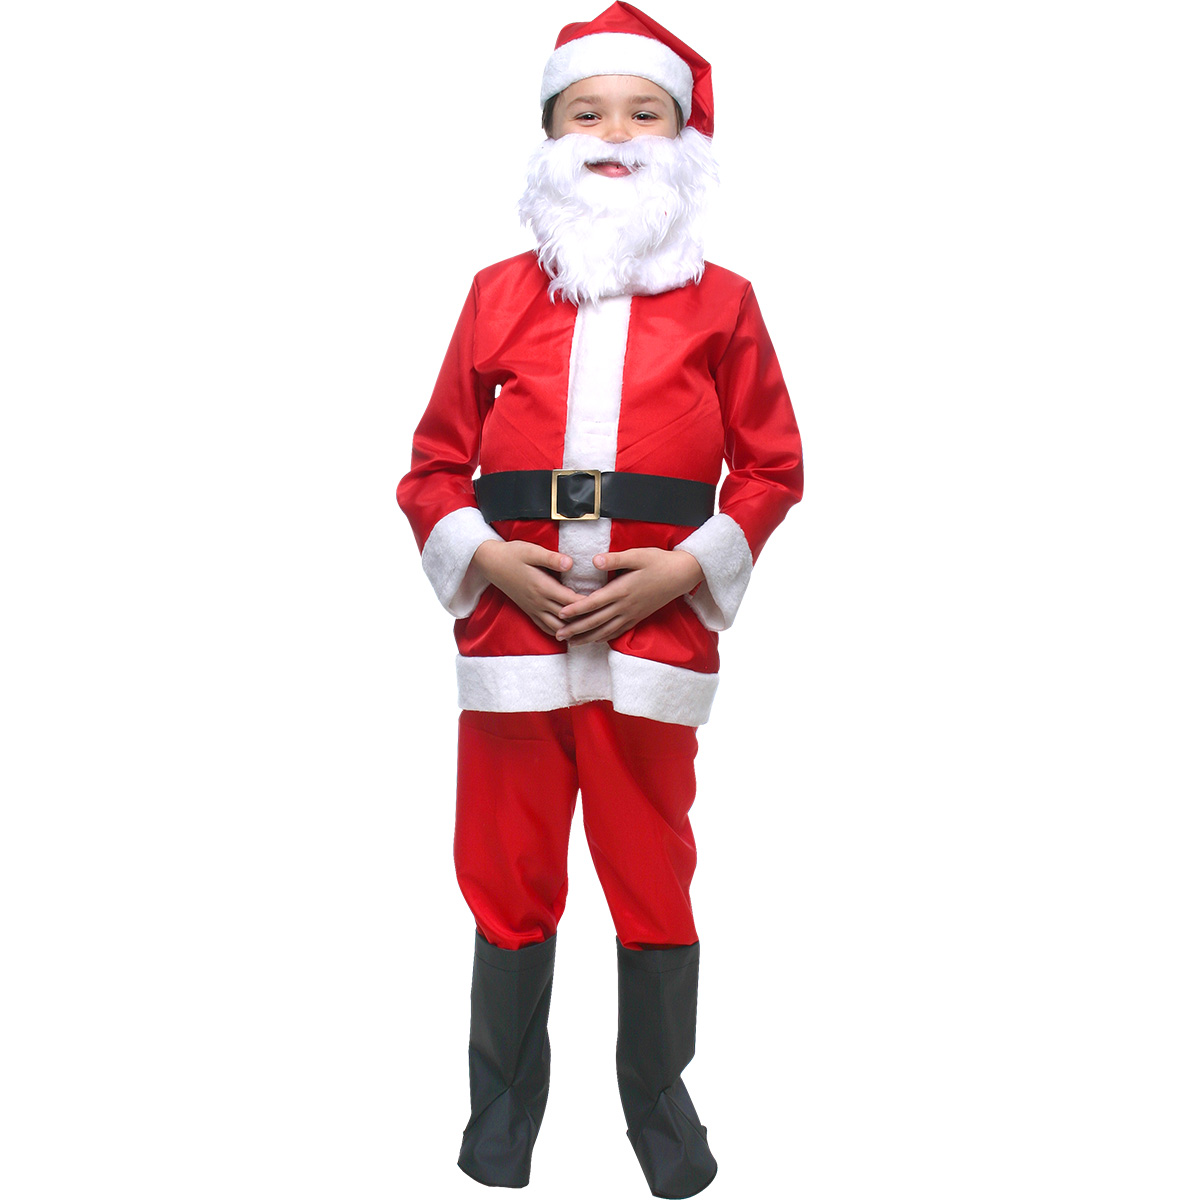 Fantasia Papai Noel Infantil aeba4e481f0